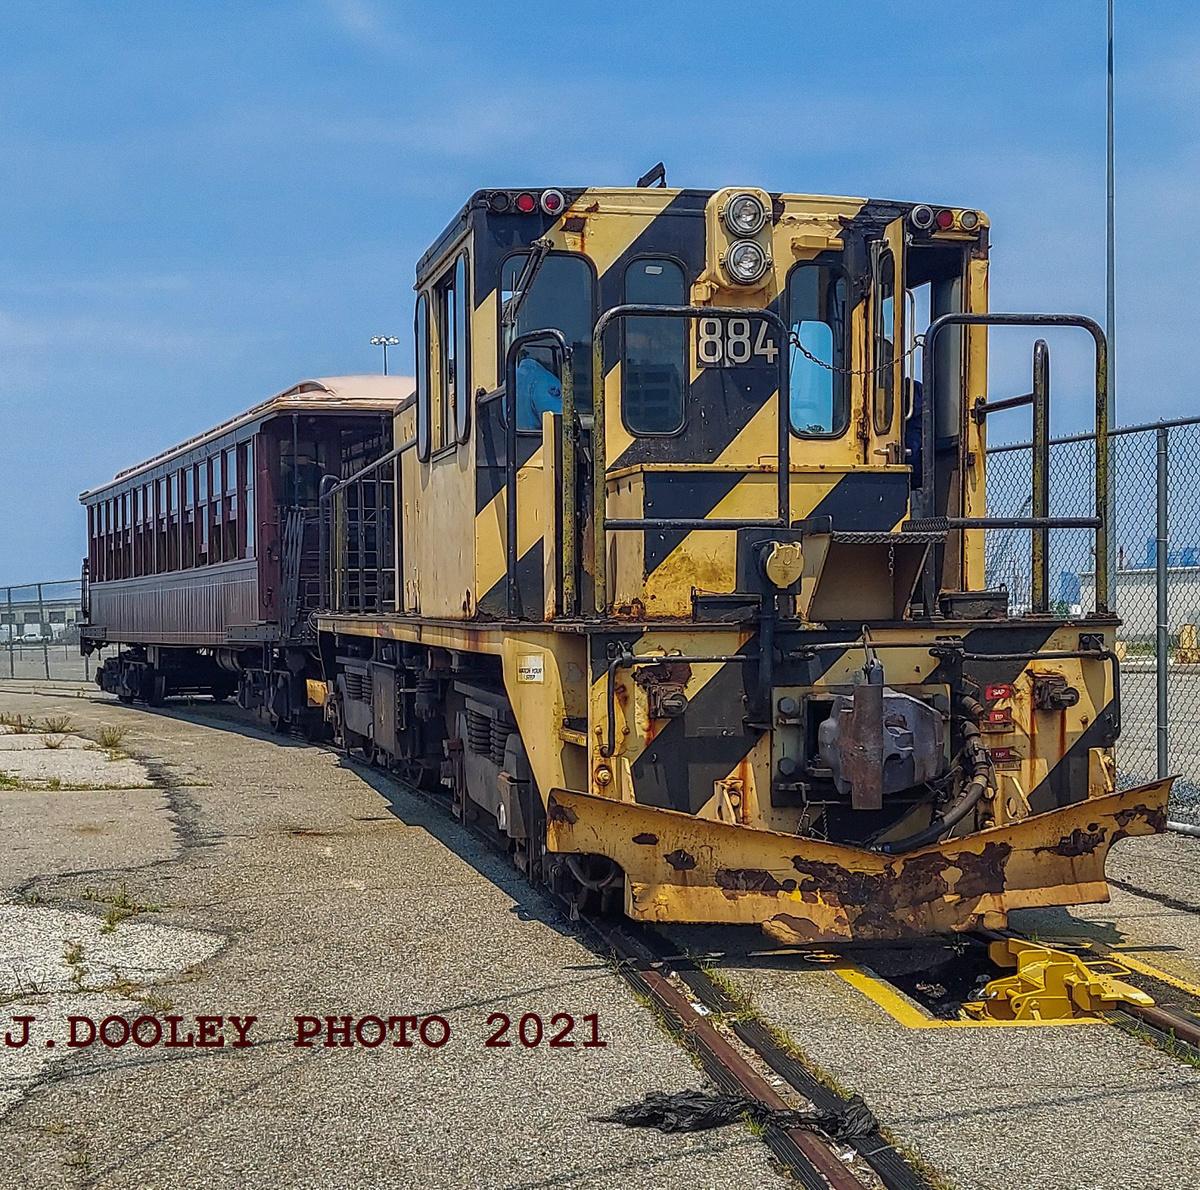 (907k, 1200x1190)<br><b>Country:</b> United States<br><b>City:</b> New York<br><b>System:</b> New York City Transit<br><b>Line:</b> South Brooklyn Railway<br><b>Location:</b> SBK Yard (2nd Ave at 38th St.) (SBK)<br><b>Car:</b> R-77 Locomotive 884 <br><b>Photo by:</b> John Dooley<br><b>Date:</b> 7/6/2021<br><b>Notes:</b> BMT gate car 1273 appeared in NYC Hometown Heroes parade 7/7/2021.<br><b>Viewed (this week/total):</b> 0 / 289